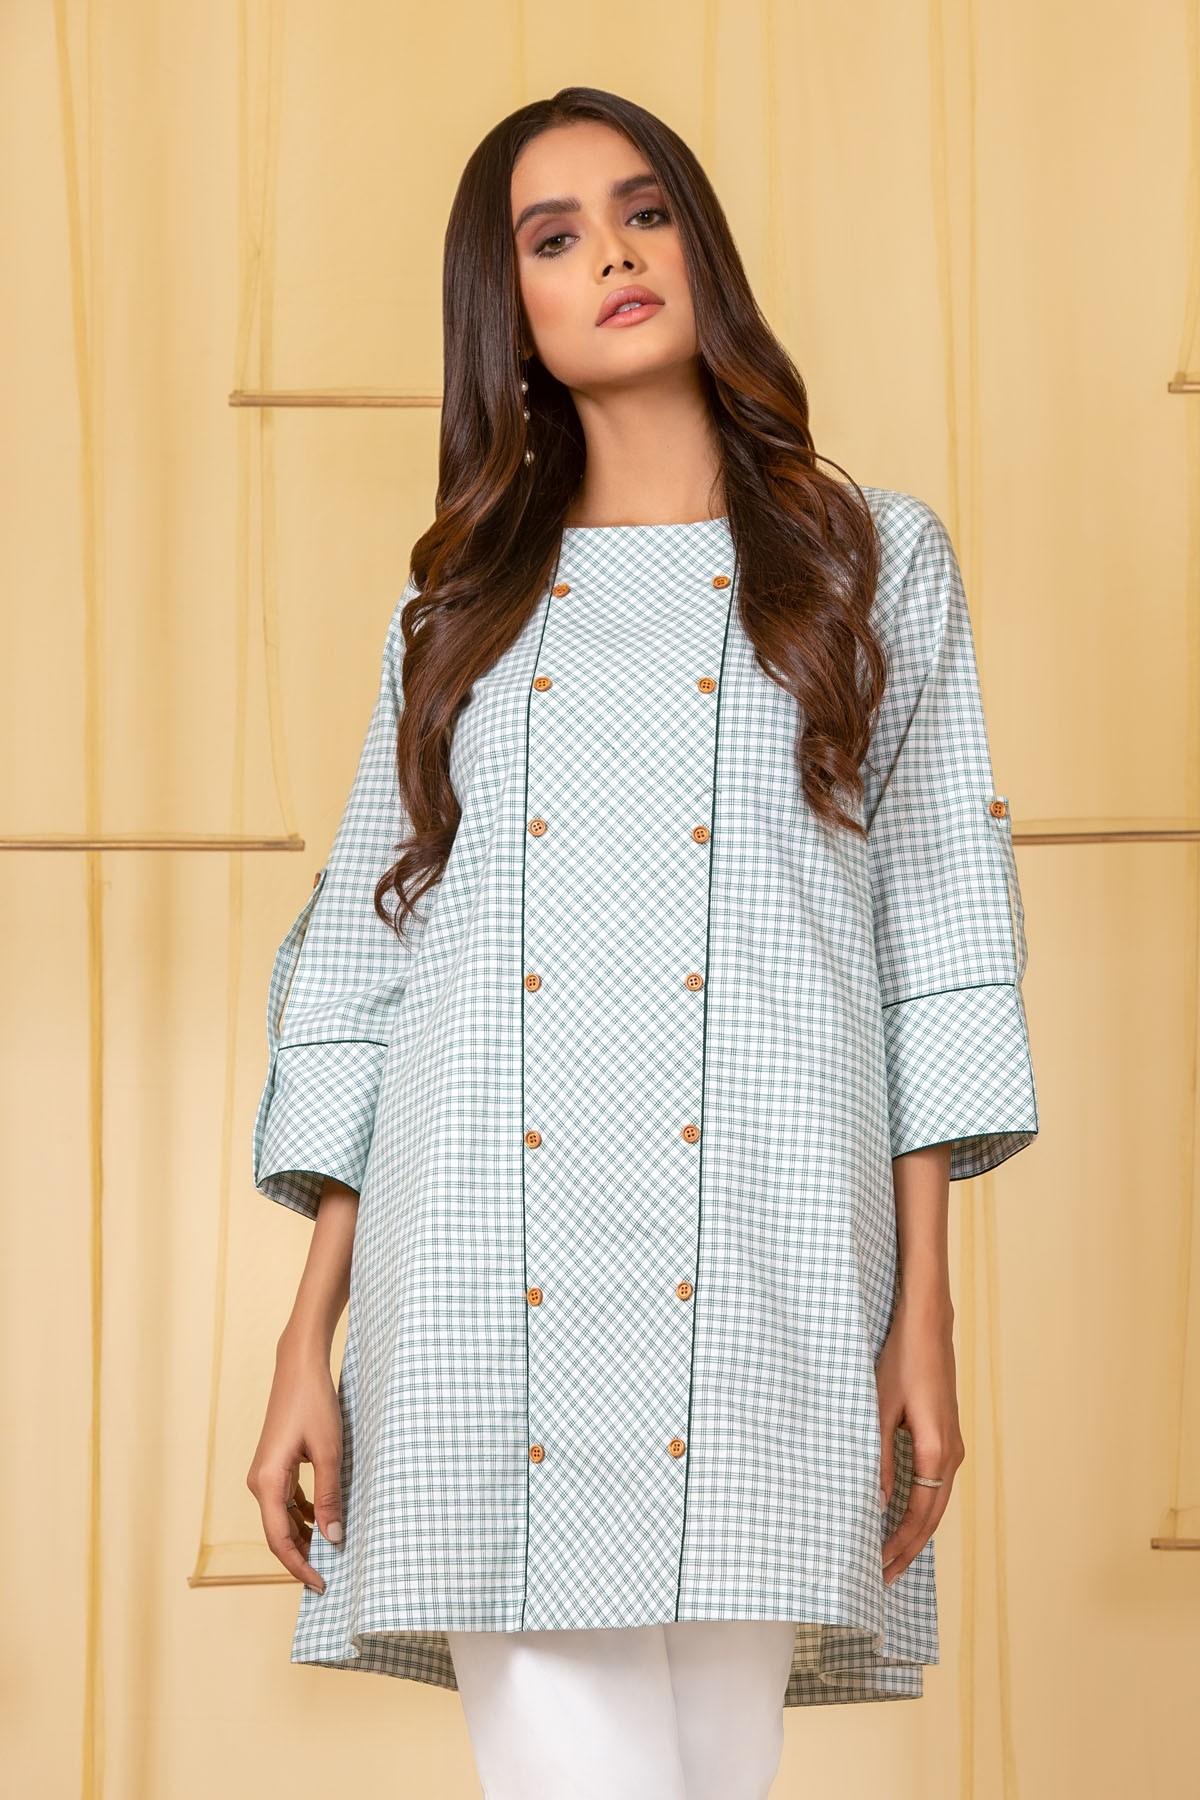 Al-Akaram winter MAK Pret collection off-whitePrinted Cotton Kurti